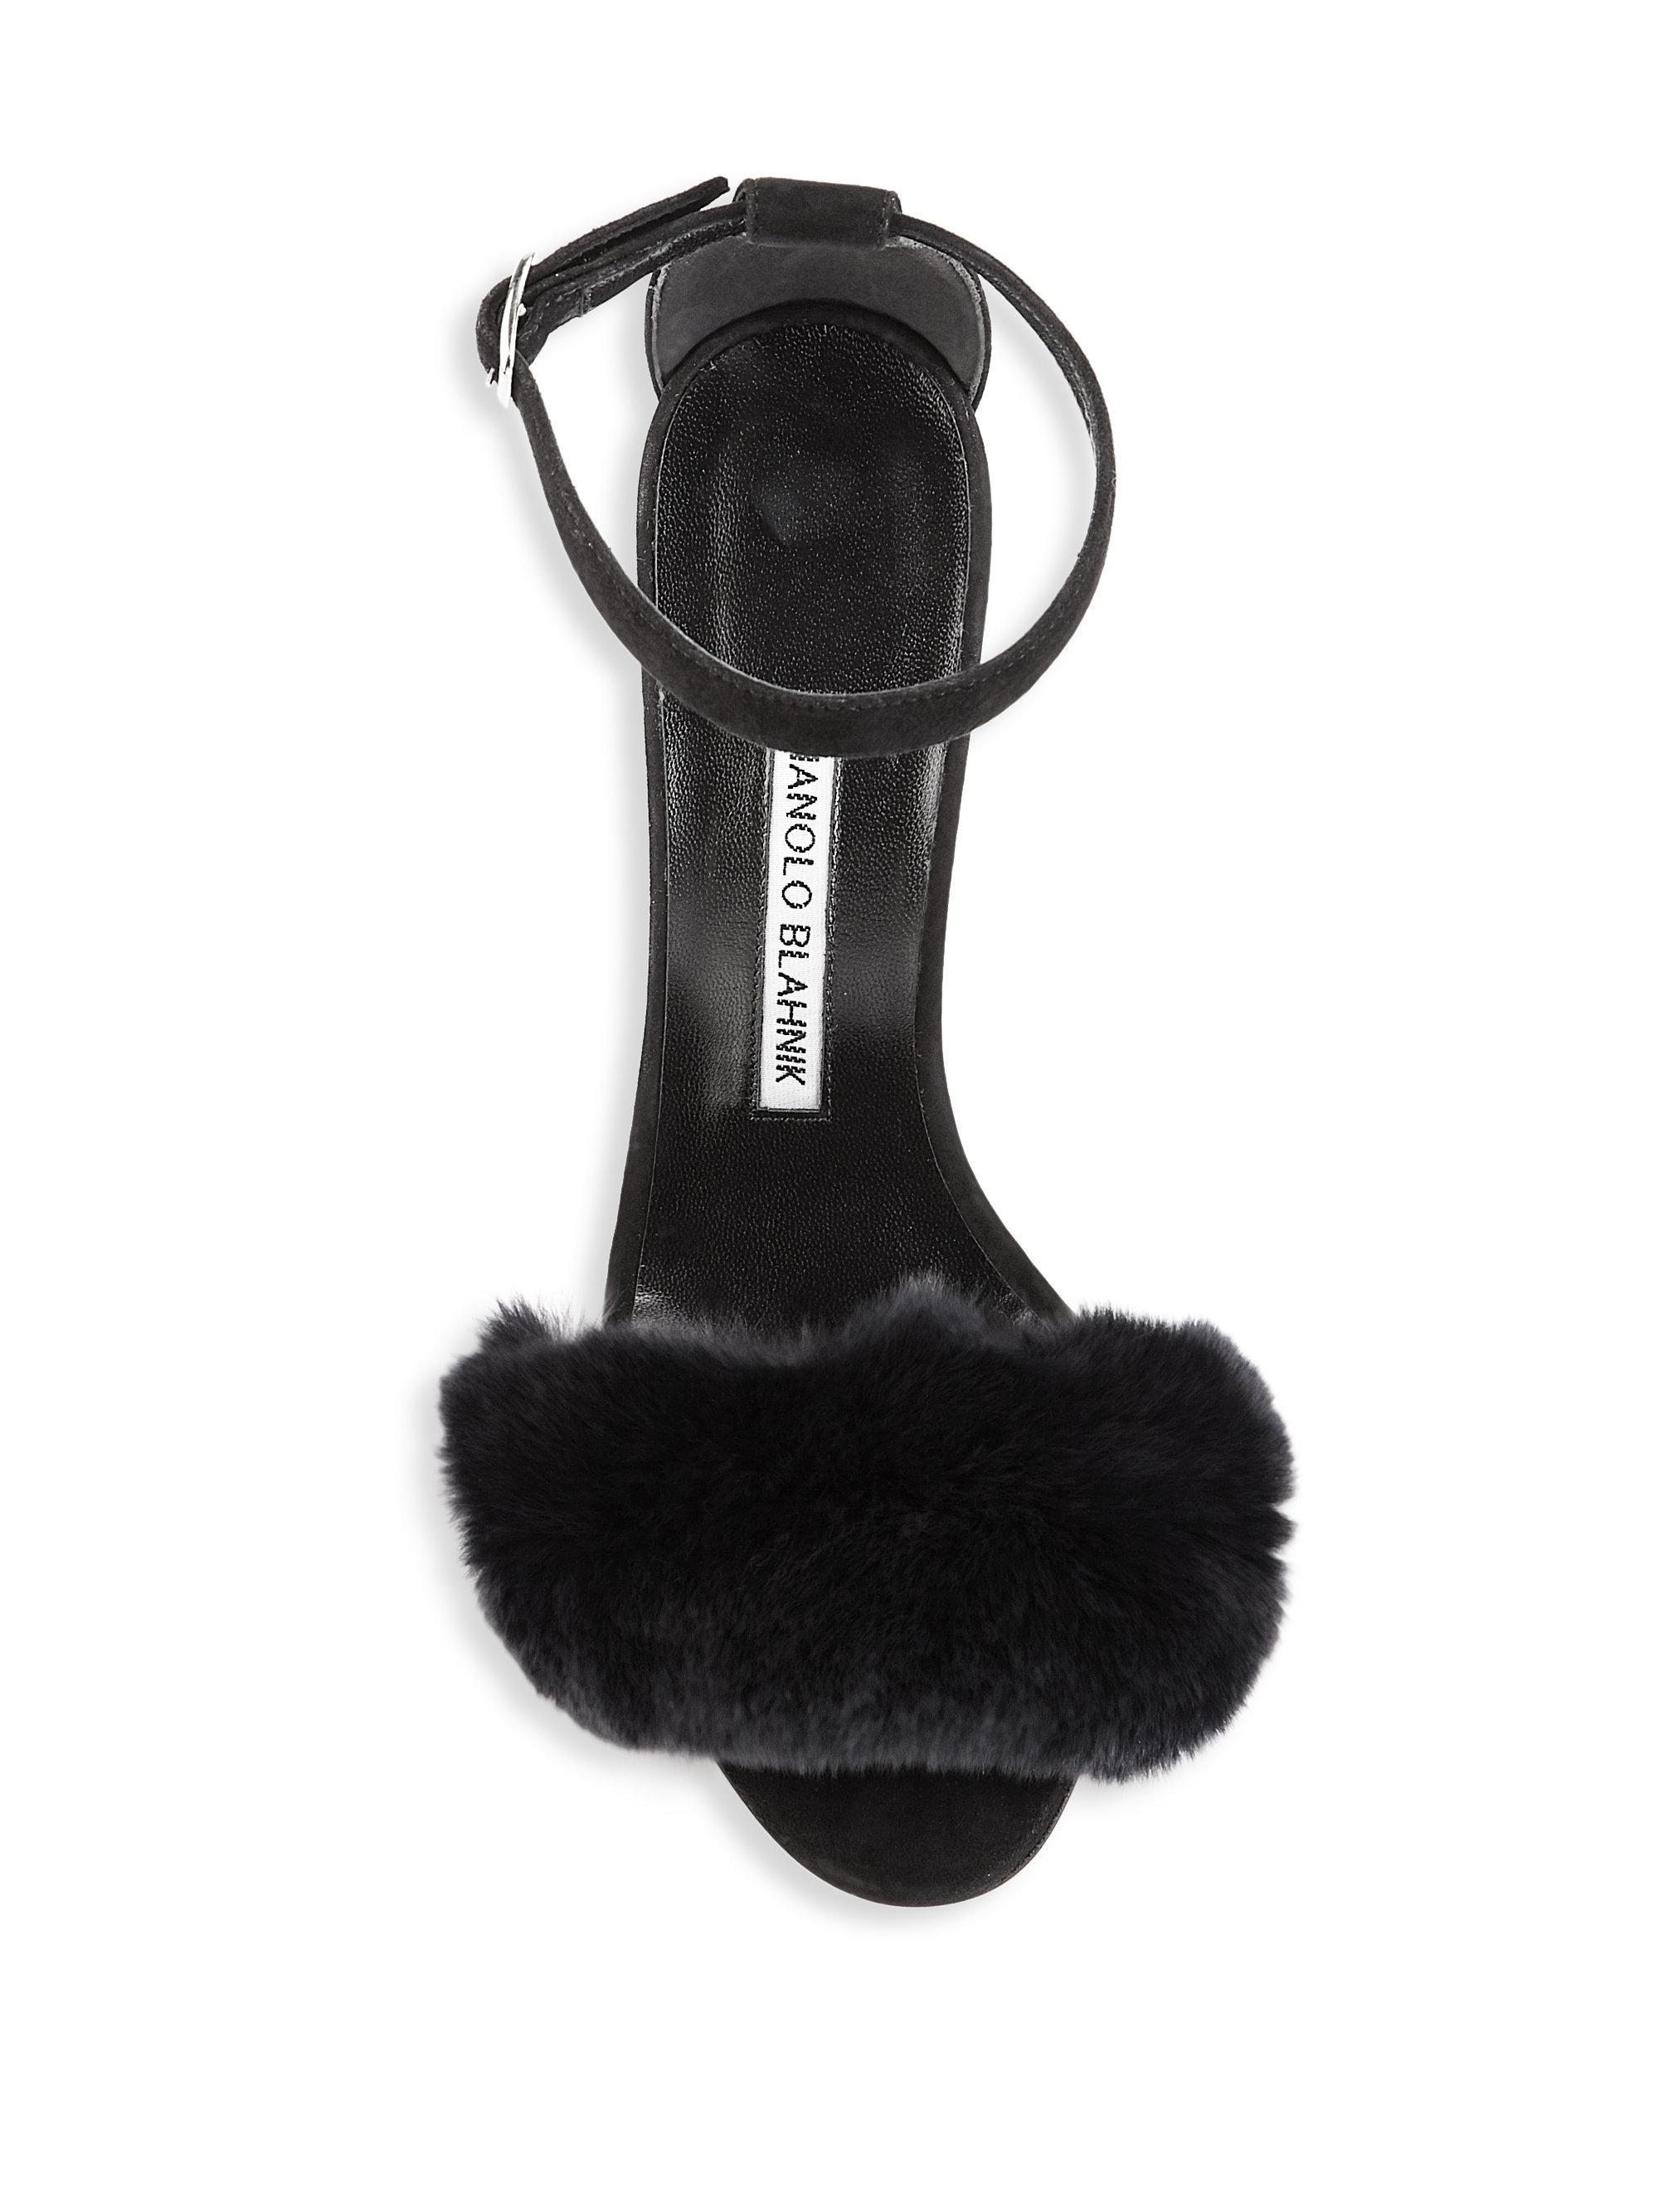 22febce4bfe66 Manolo Blahnik Mincha Fur-trim Suede Sandals in Black - Lyst